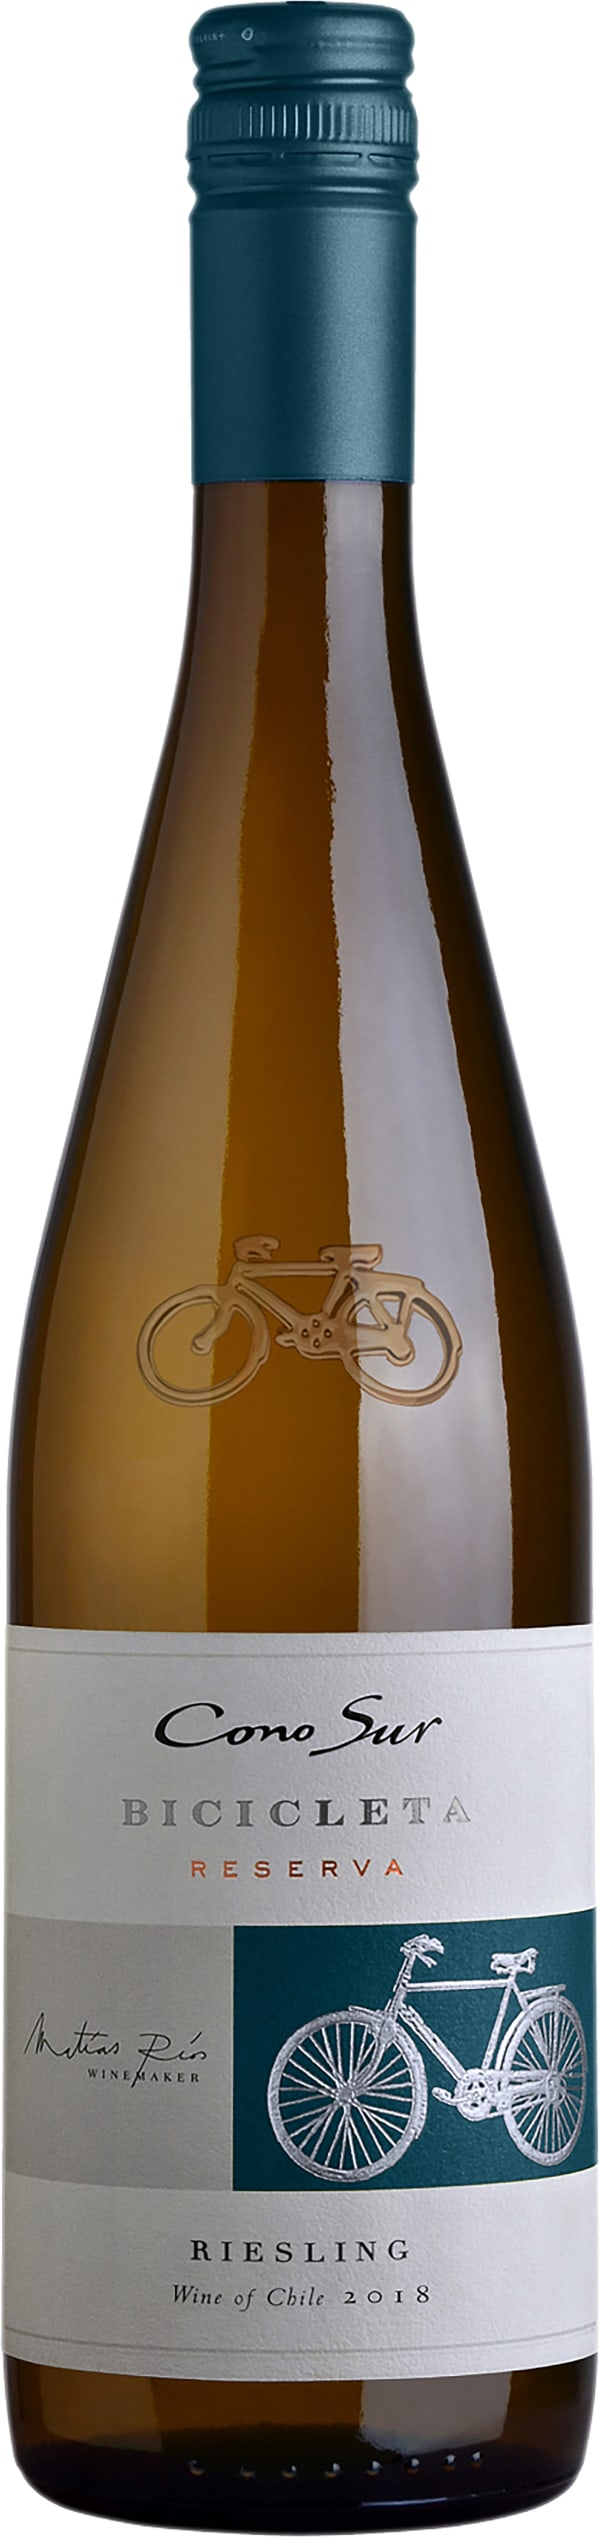 Cono Sur Bicicleta Riesling 2016